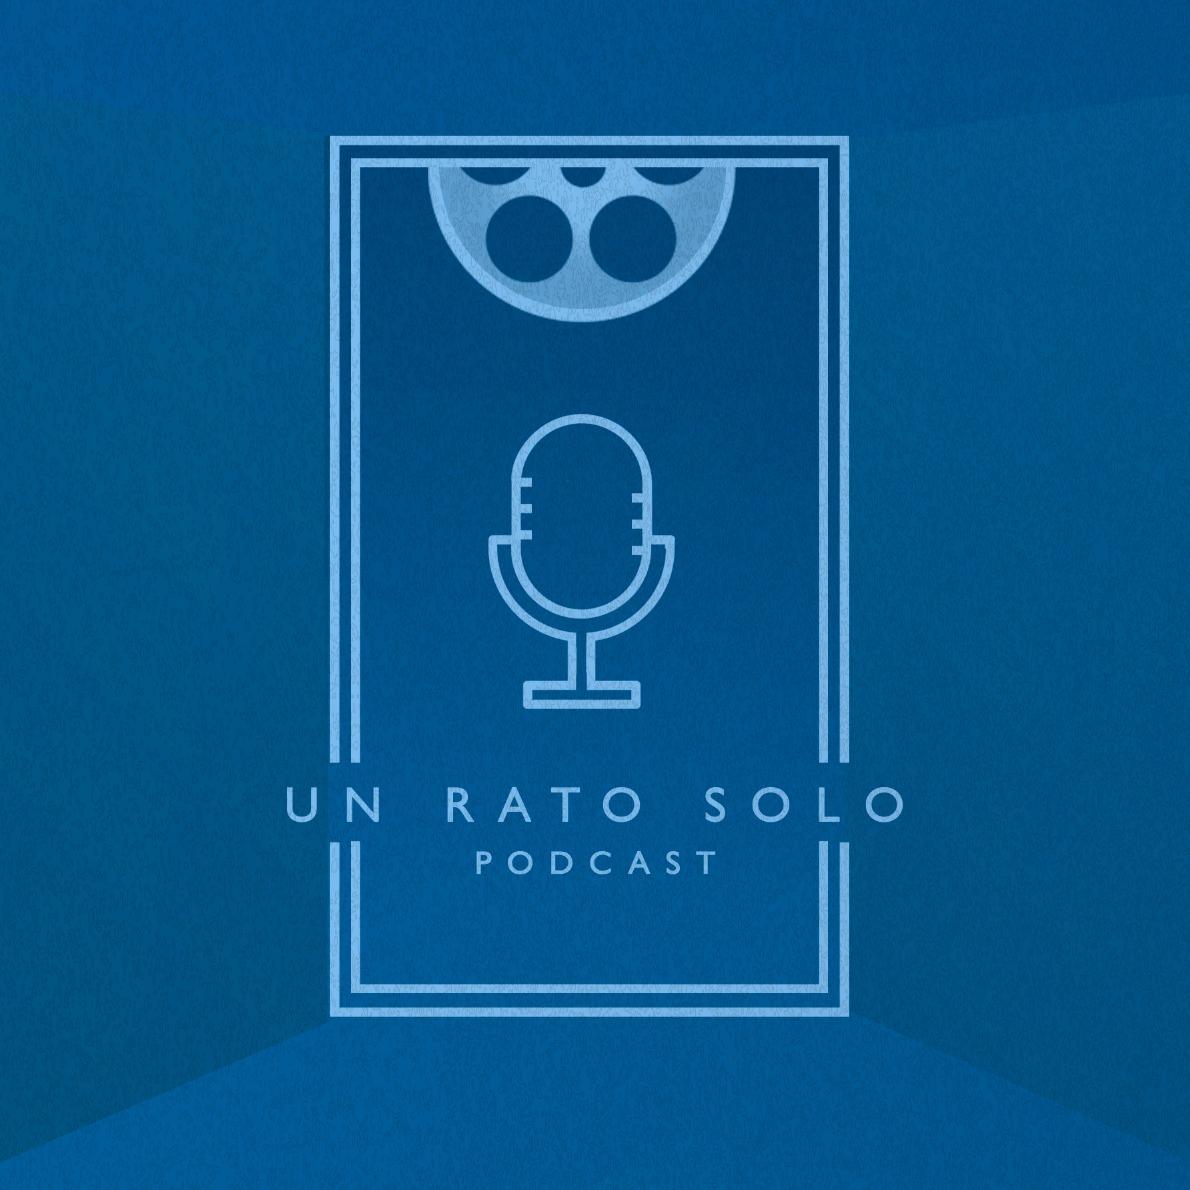 @unratosolo Profile Image | Linktree